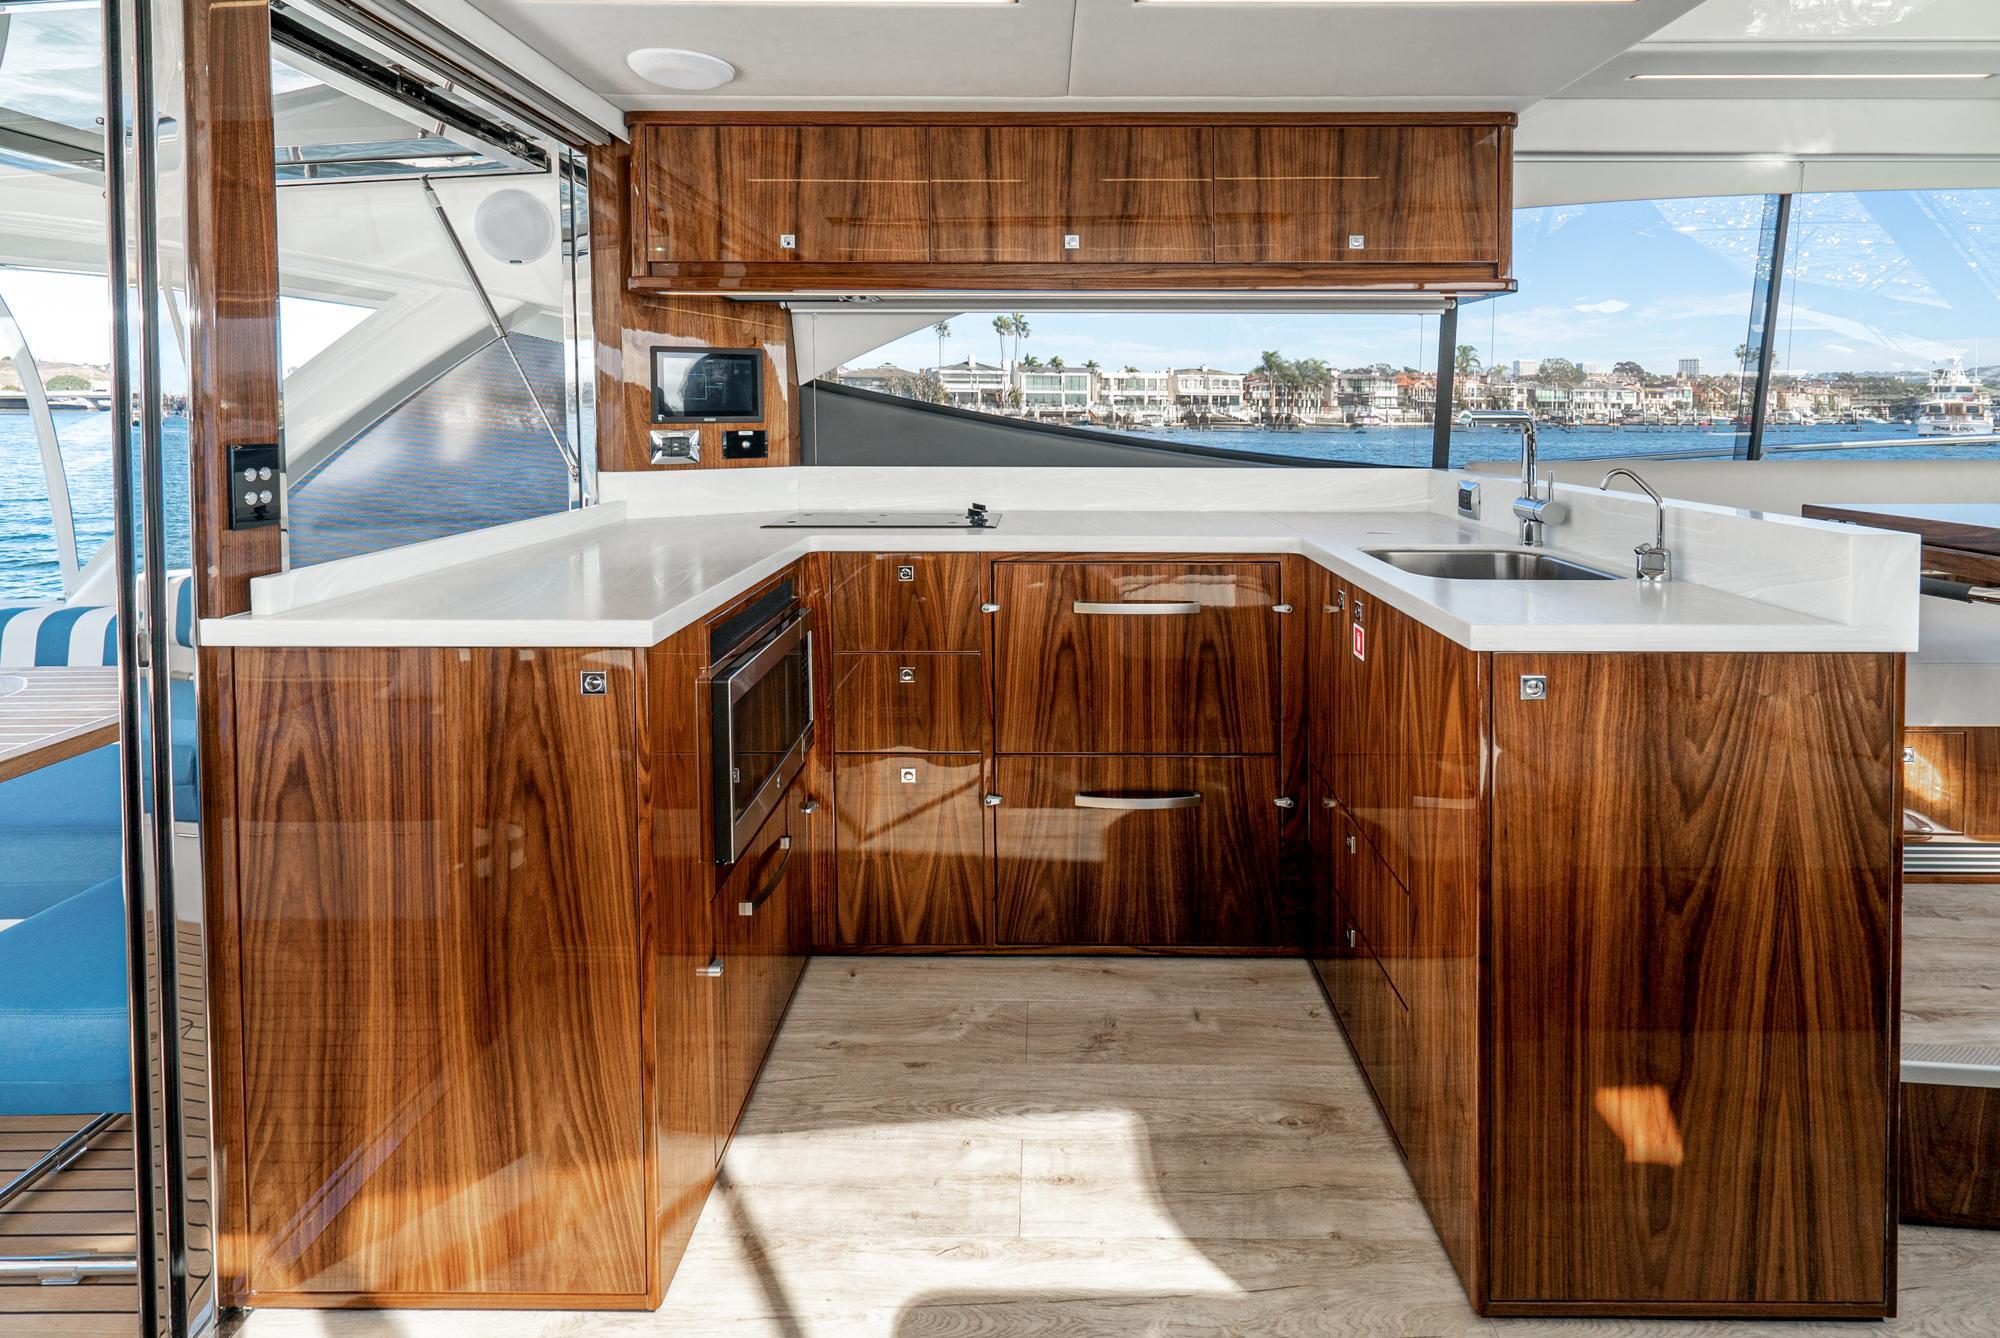 2021 Riviera 505 SUV #R015 inventory image at Sun Country Coastal in Newport Beach